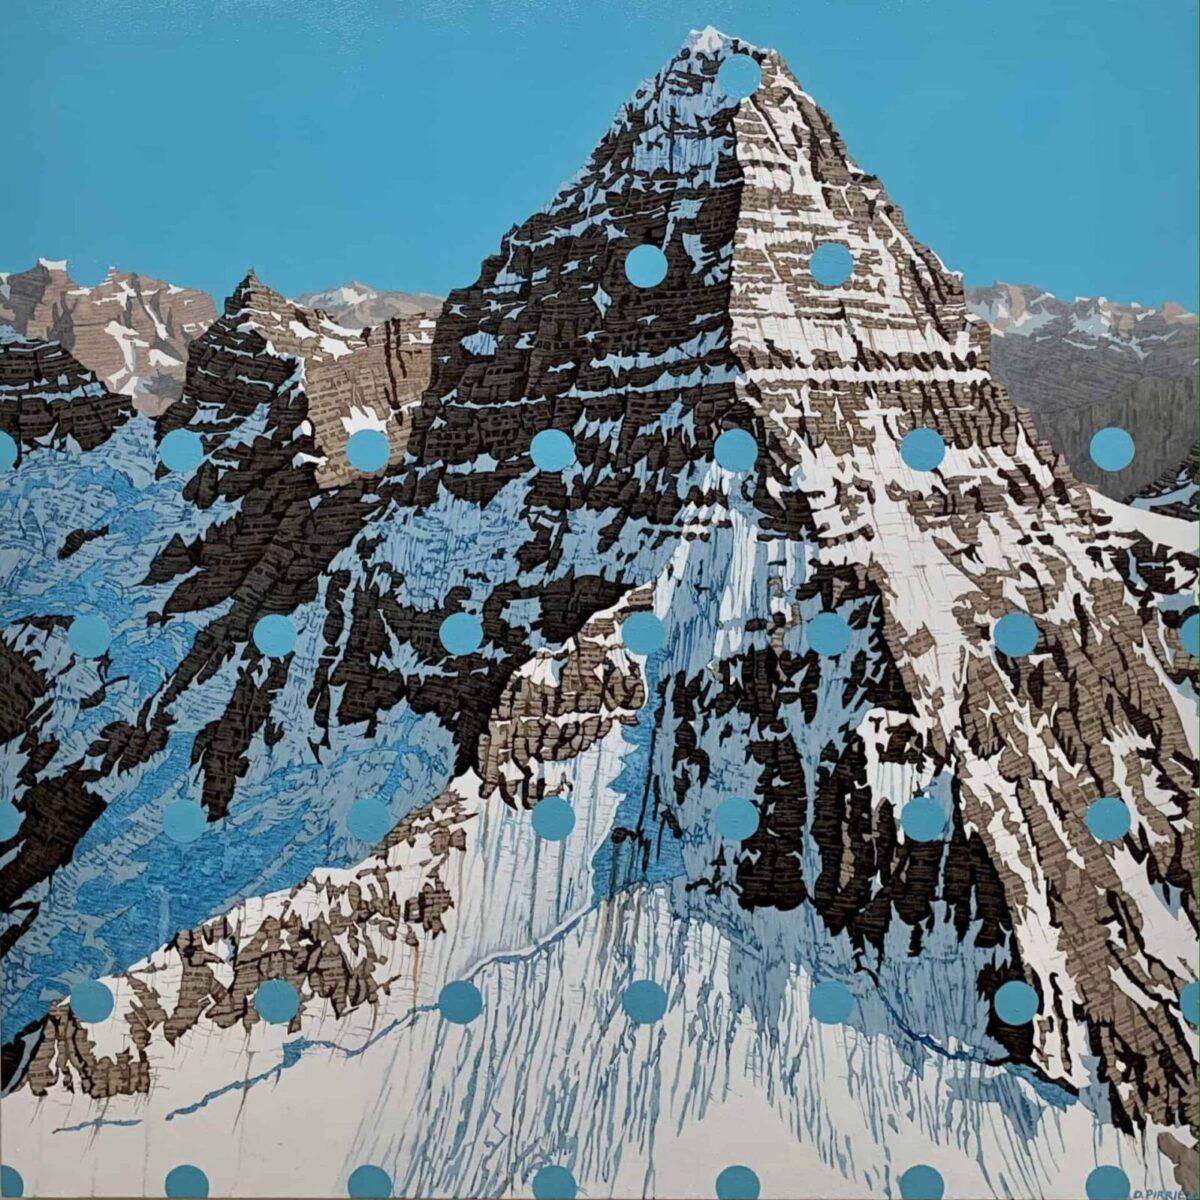 David Pirrie Mt Assiniboine, BC Rockies